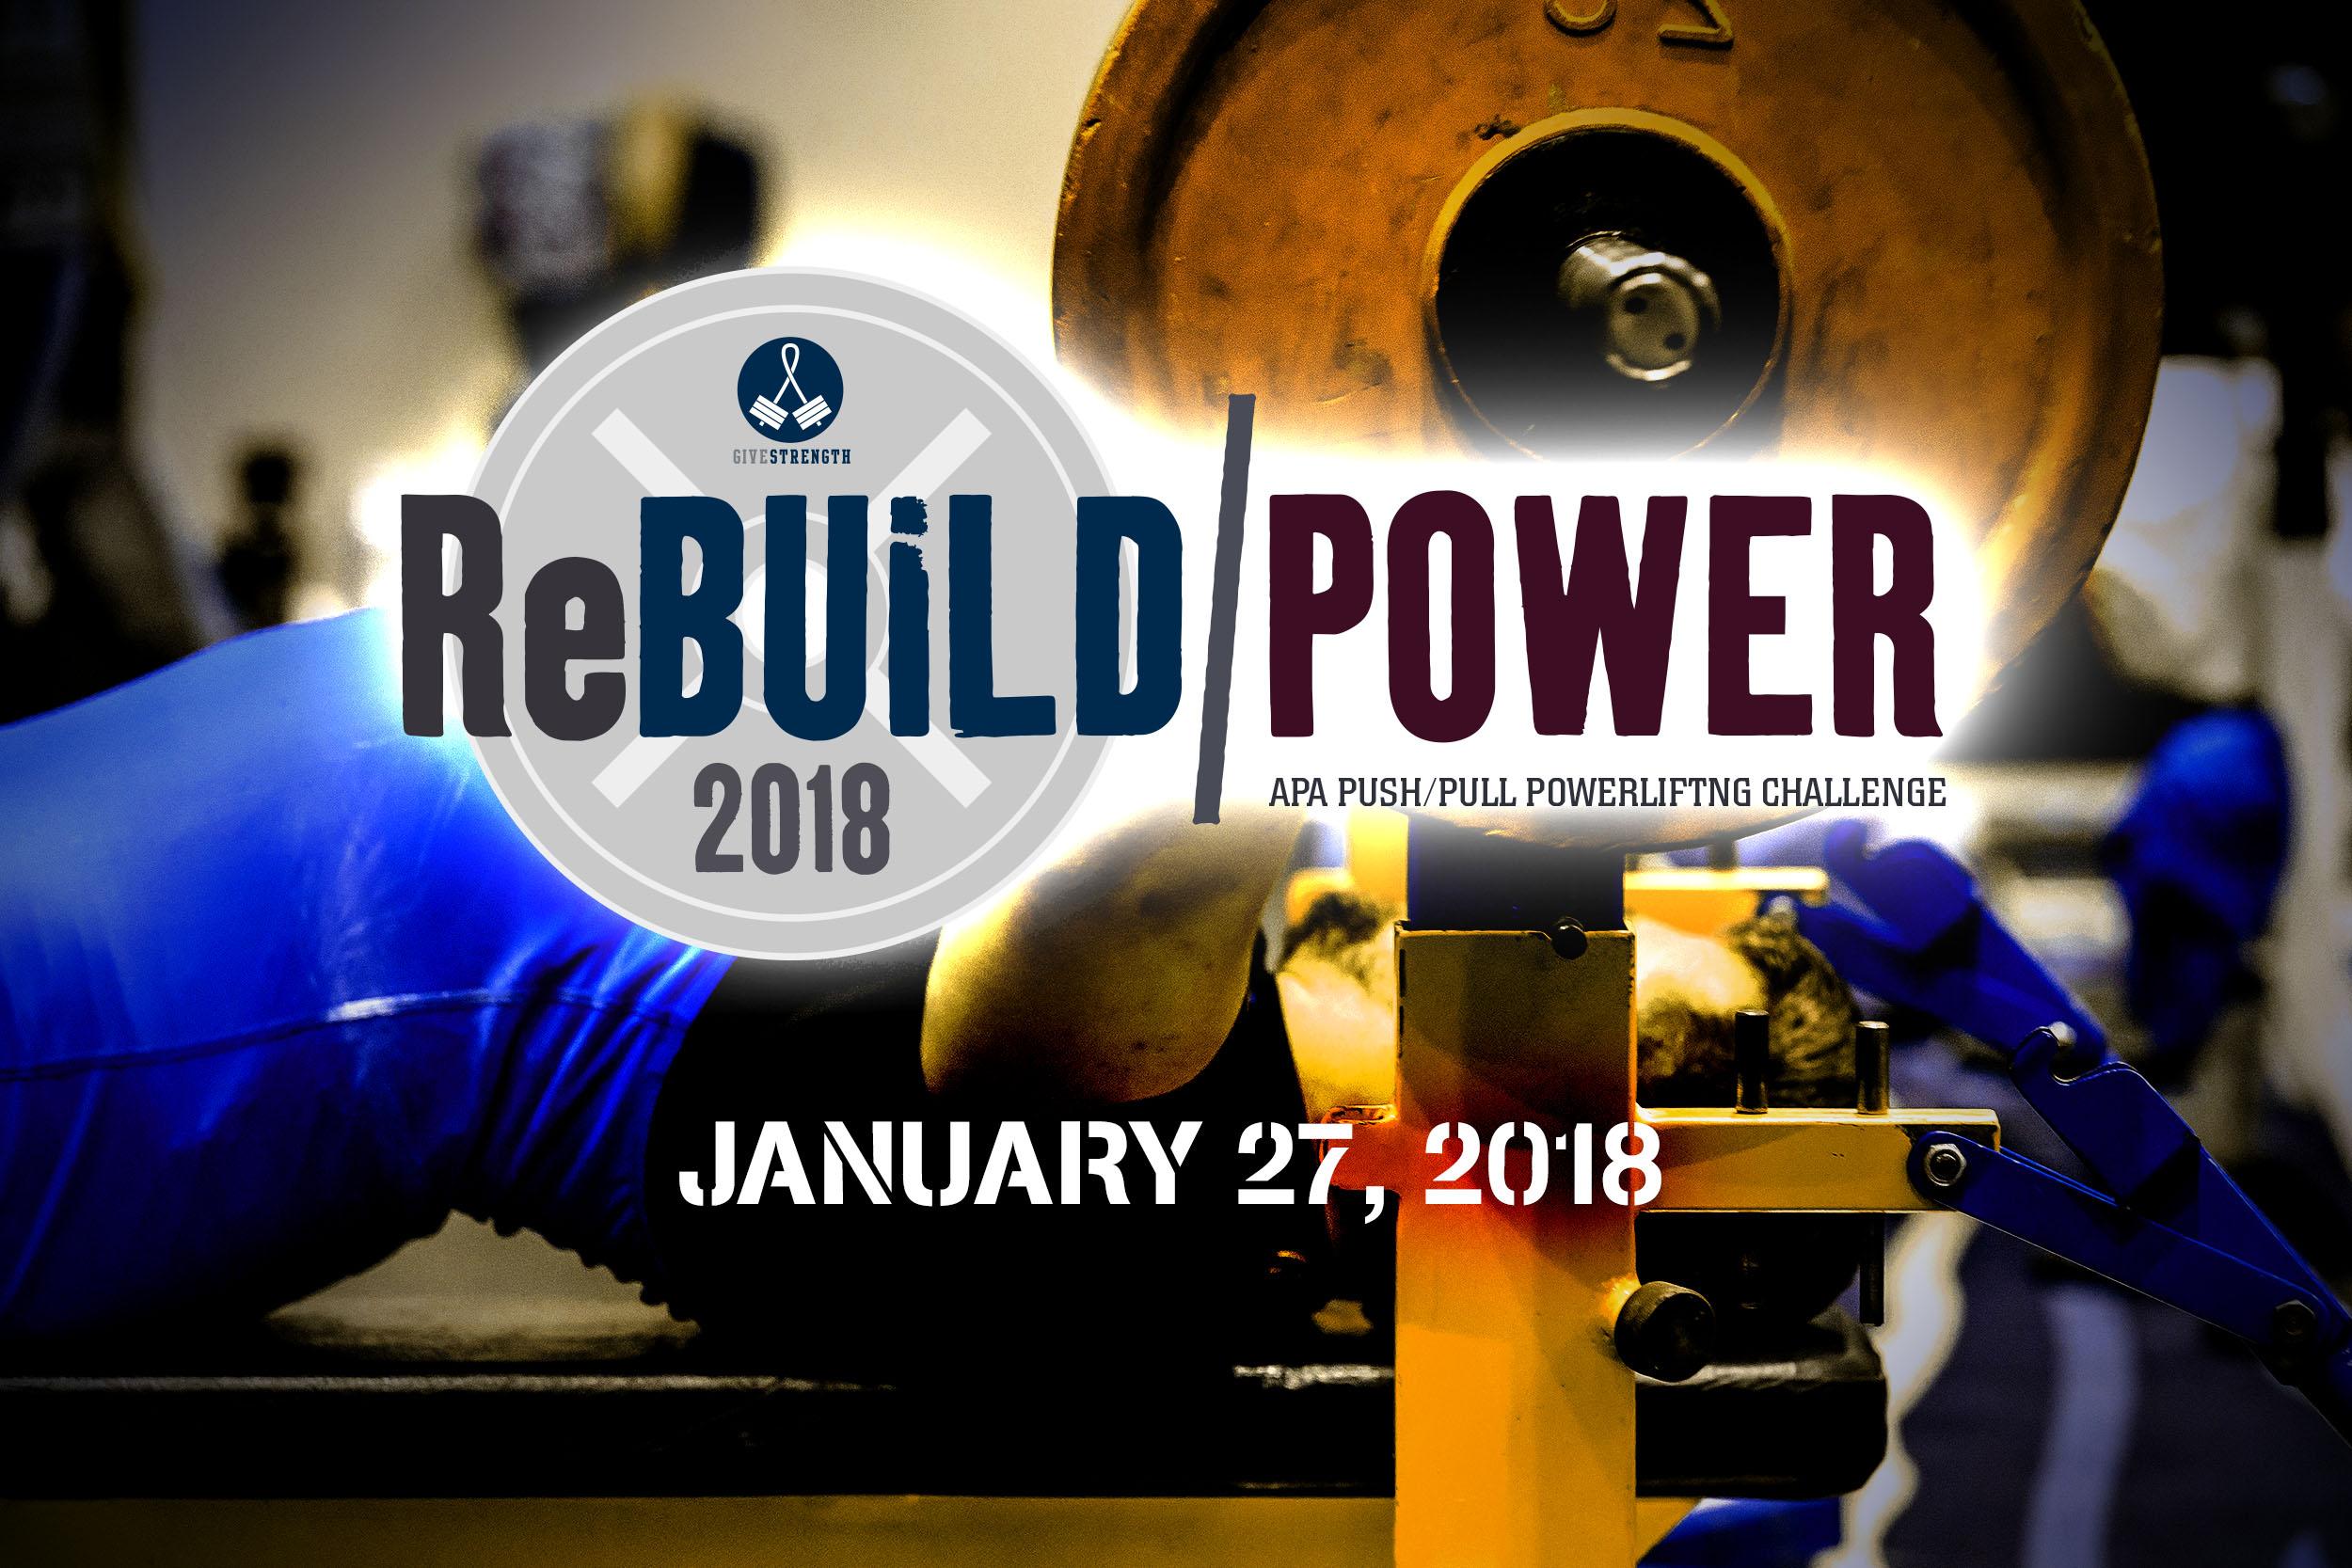 ReBUILD Power Event Thumb.jpg